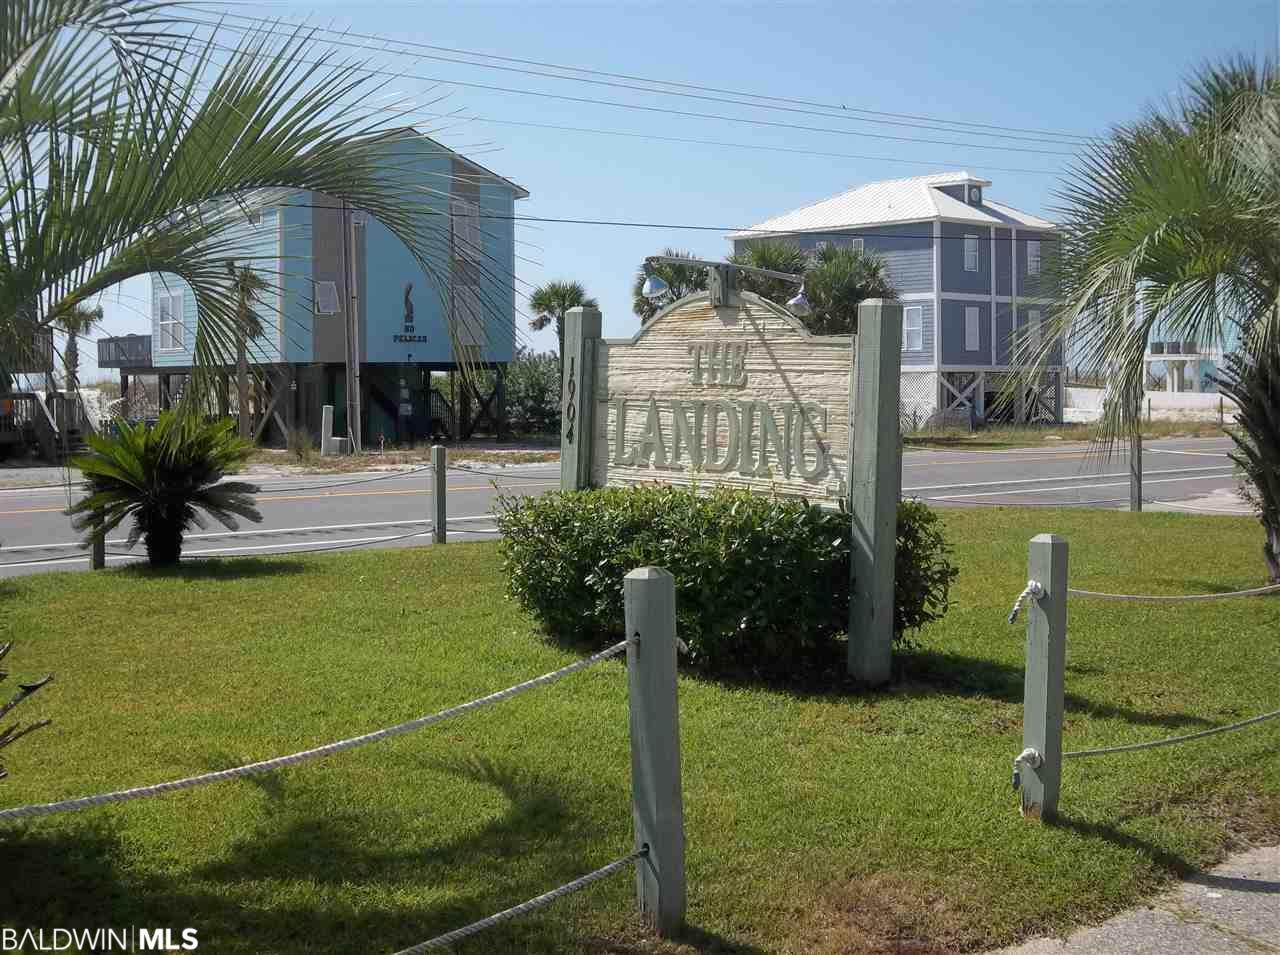 1904 W Beach Blvd 213, Gulf Shores, AL 36542